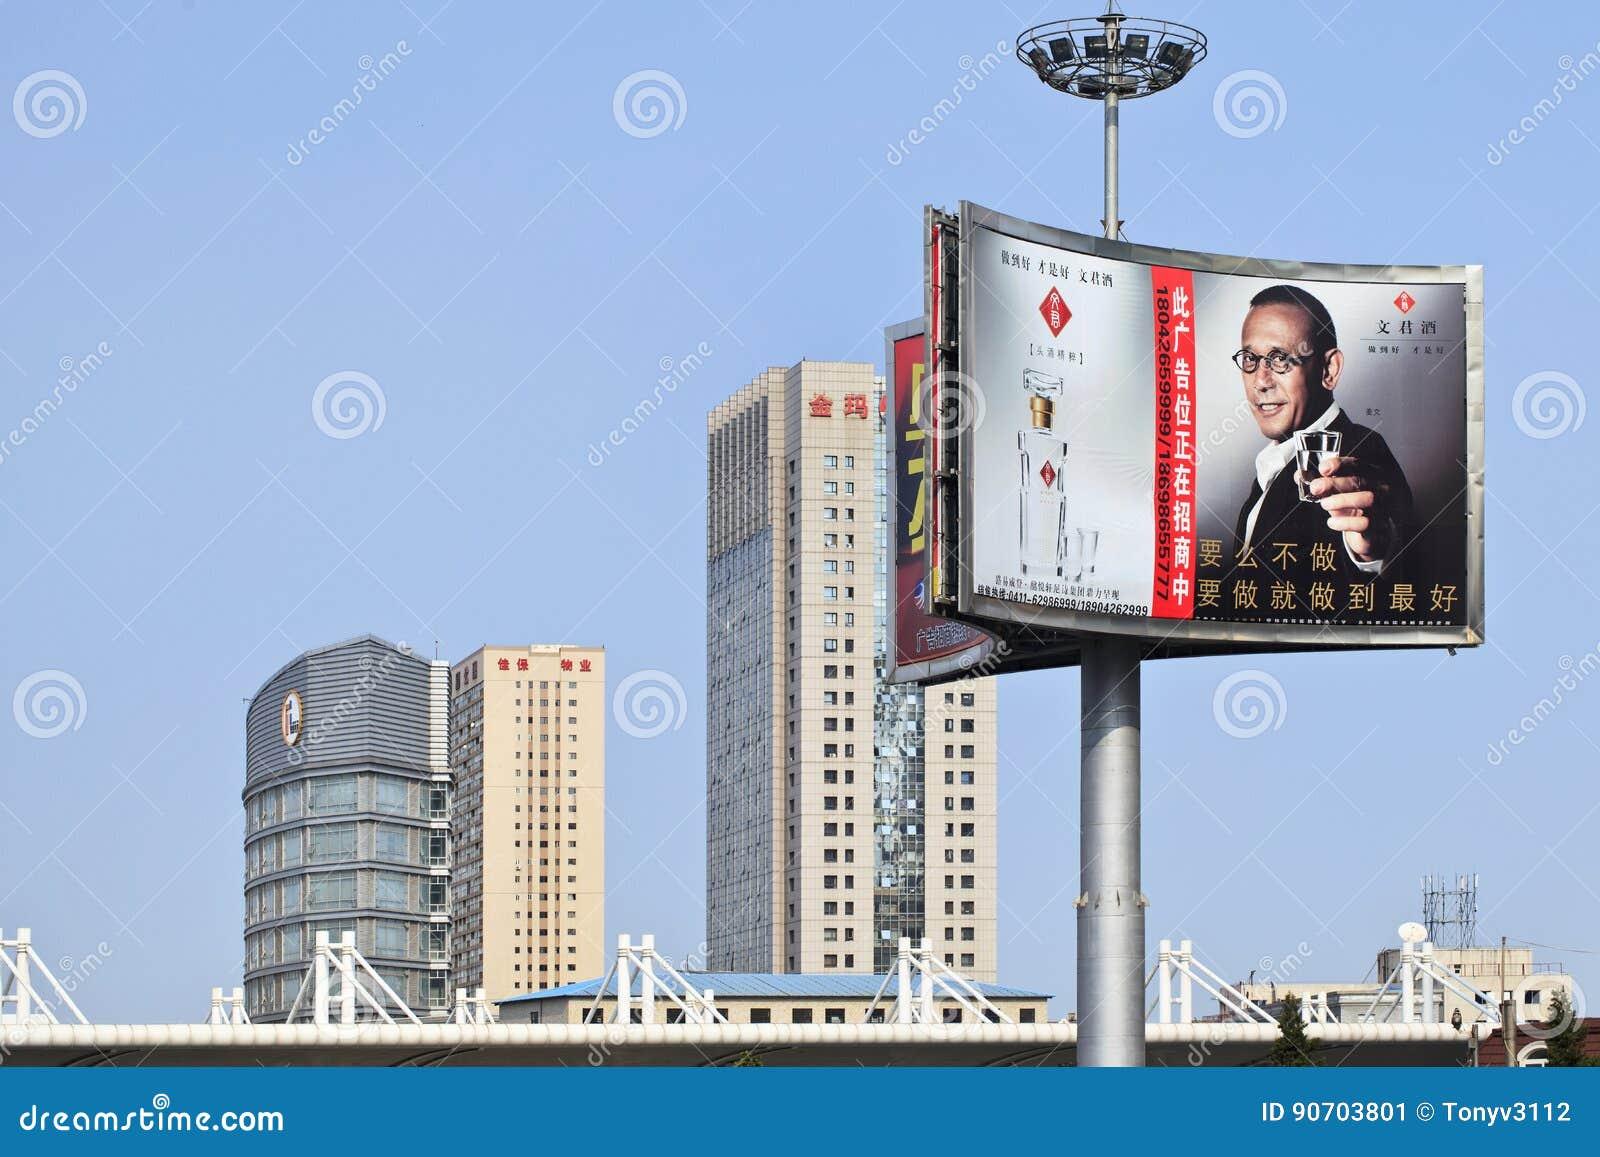 Adverte de la cartelera con la celebridad china, Dalian, China